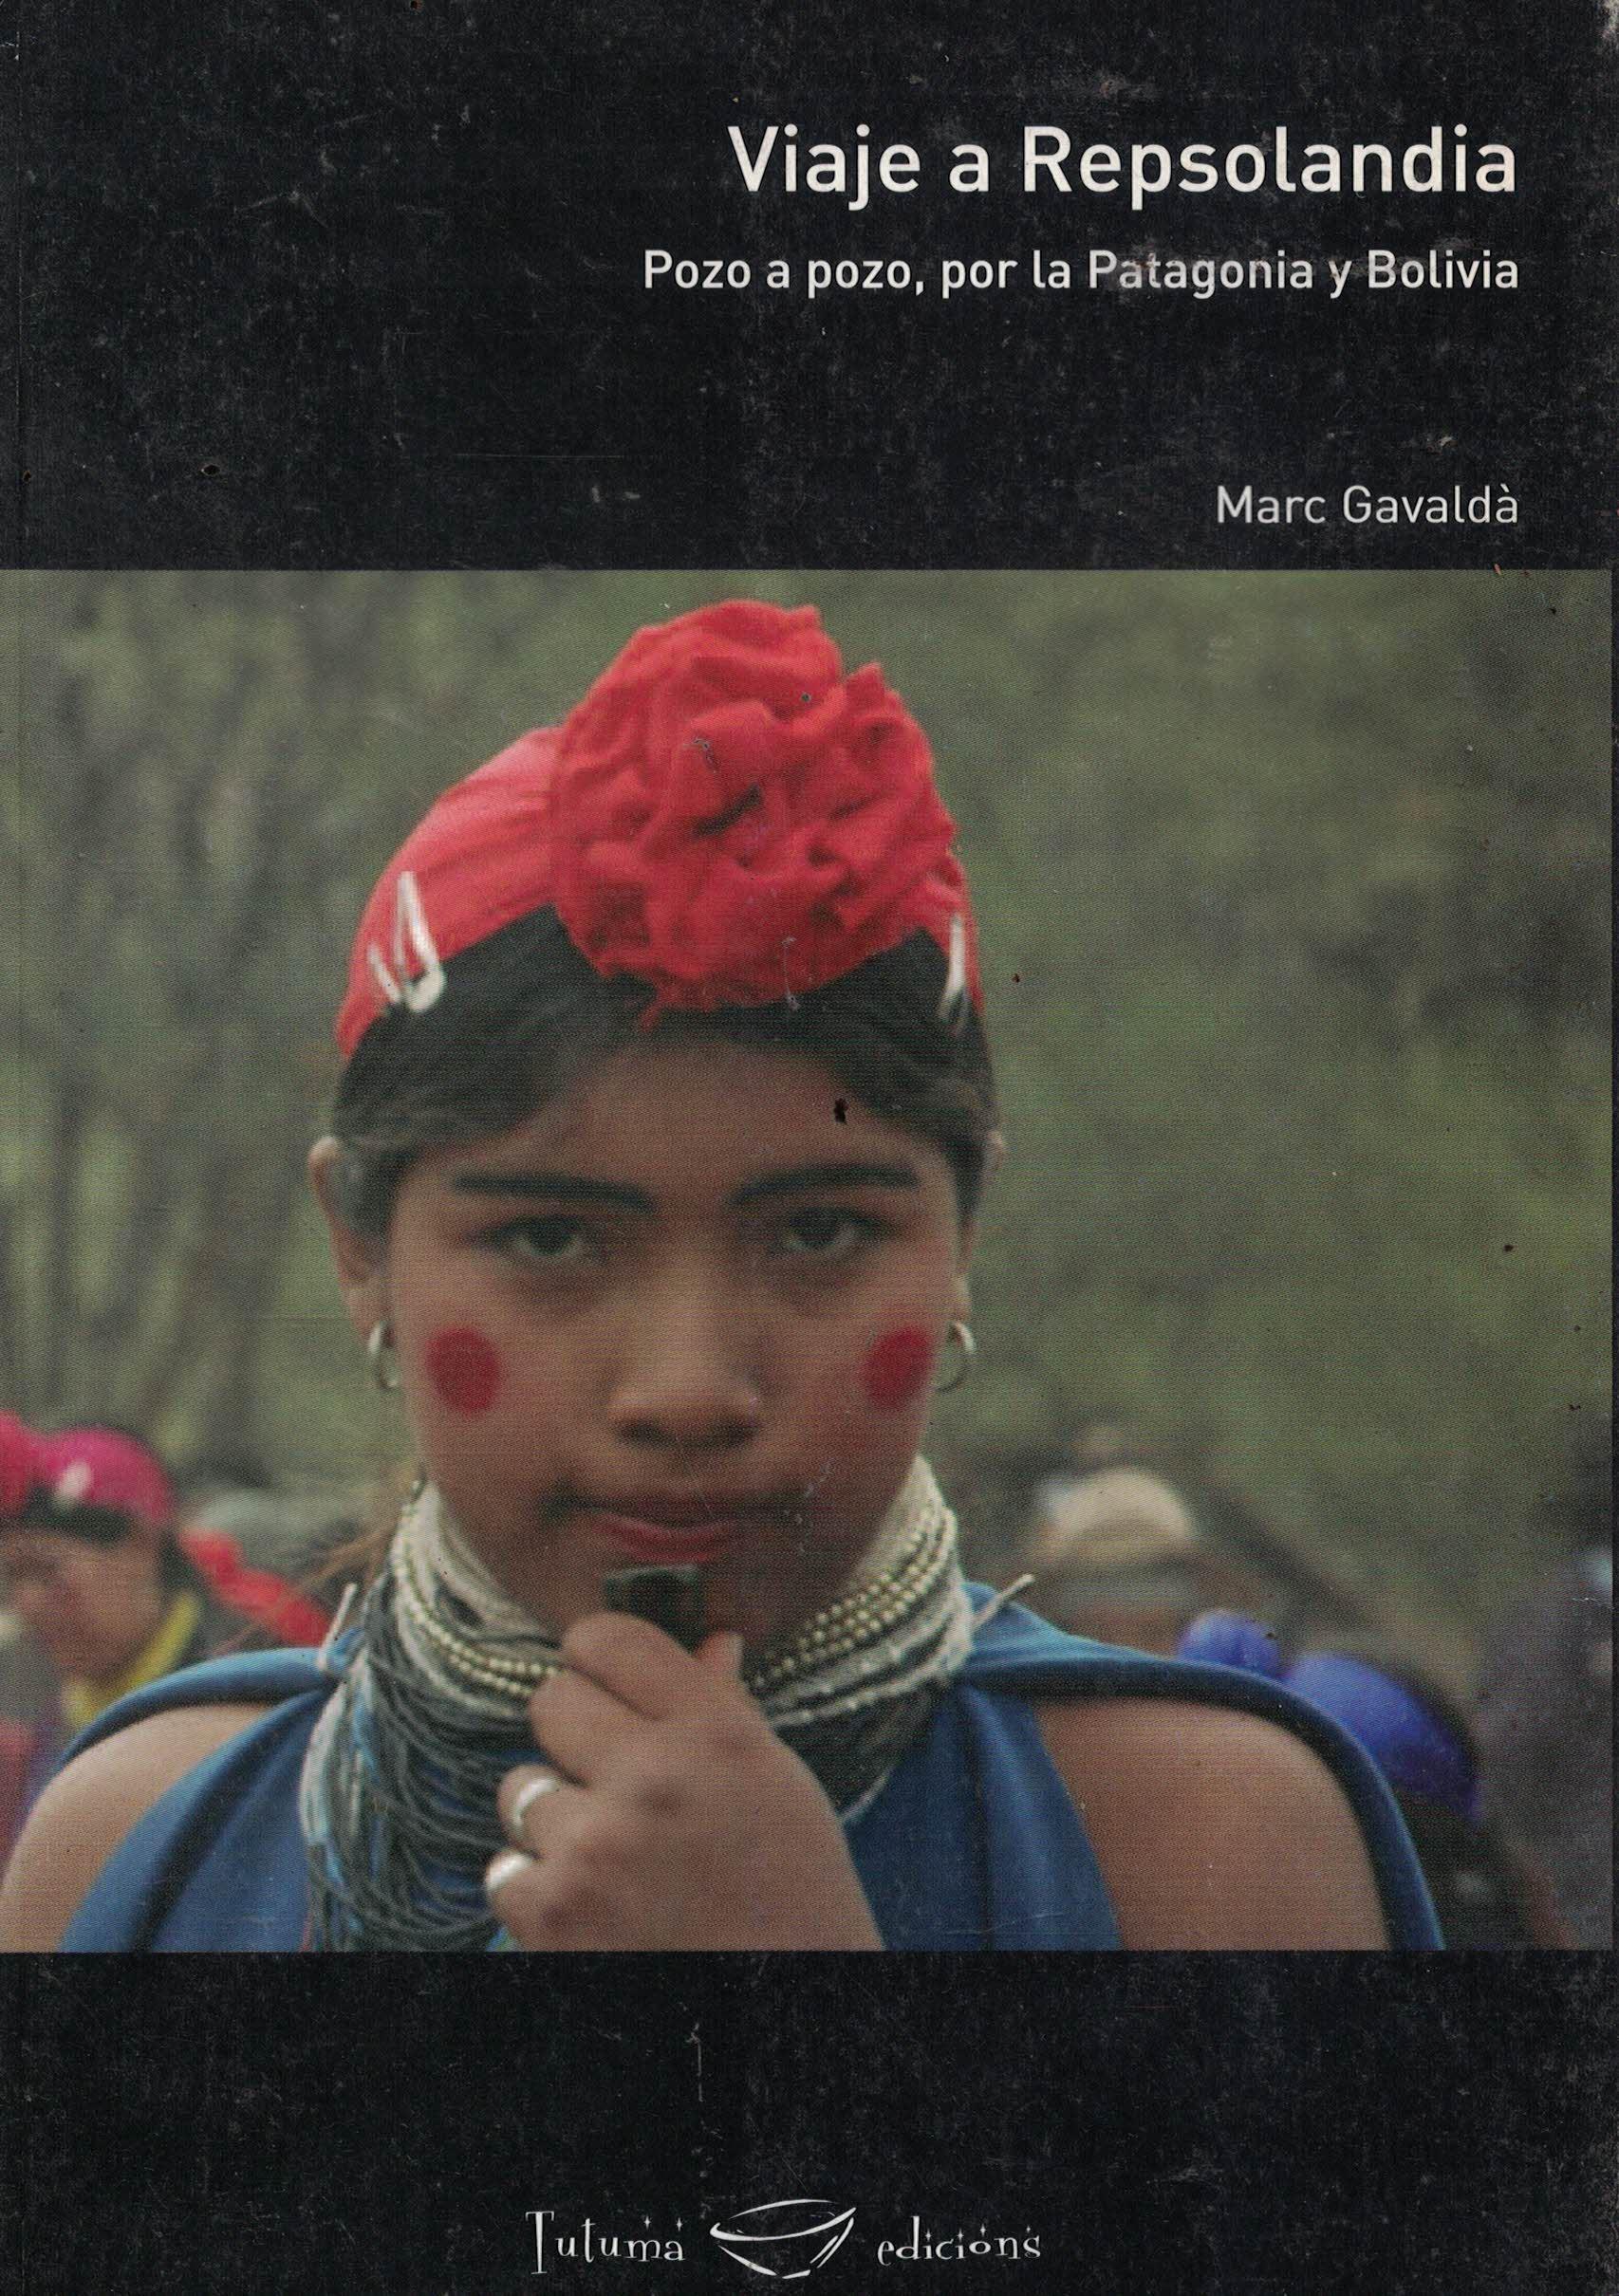 Viaje a Repsolandia «Pozo a pozo, por la Patagonia y Bolivia»